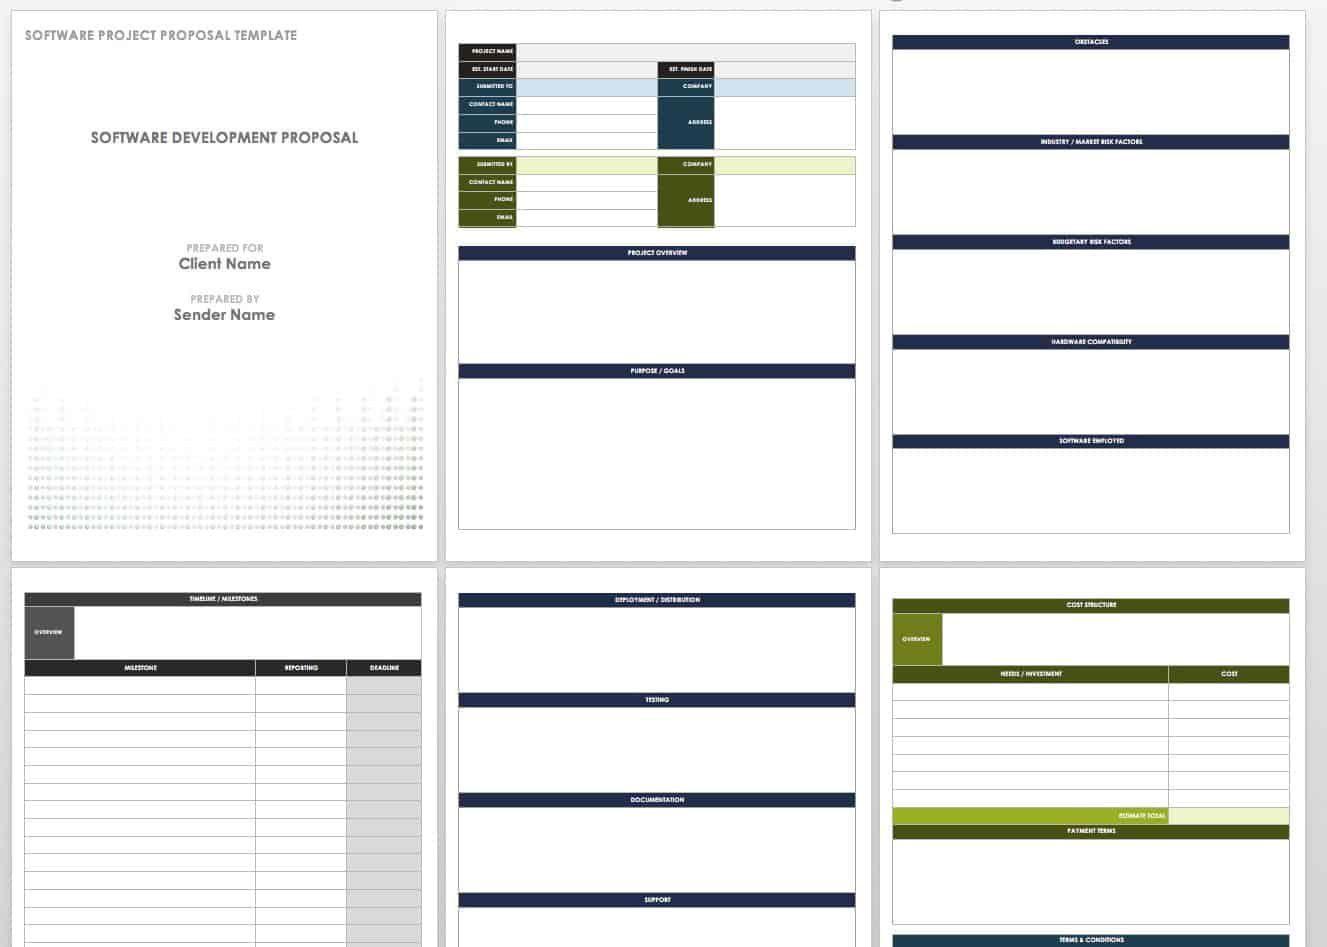 006 Fantastic Web Design Proposal Template Free Download Concept Full